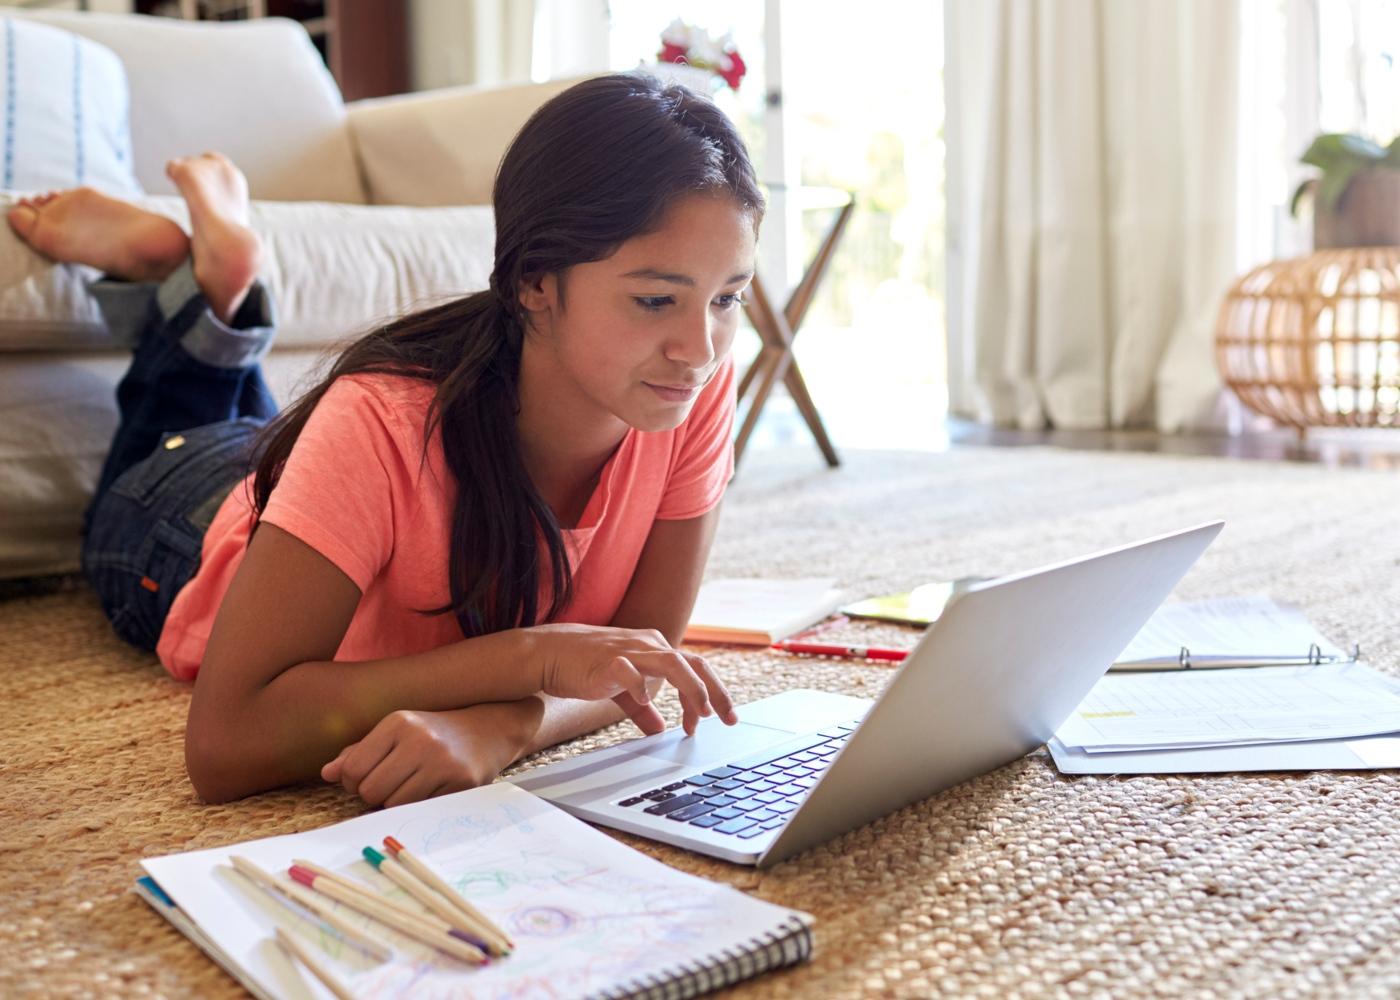 Adolescente a estudar